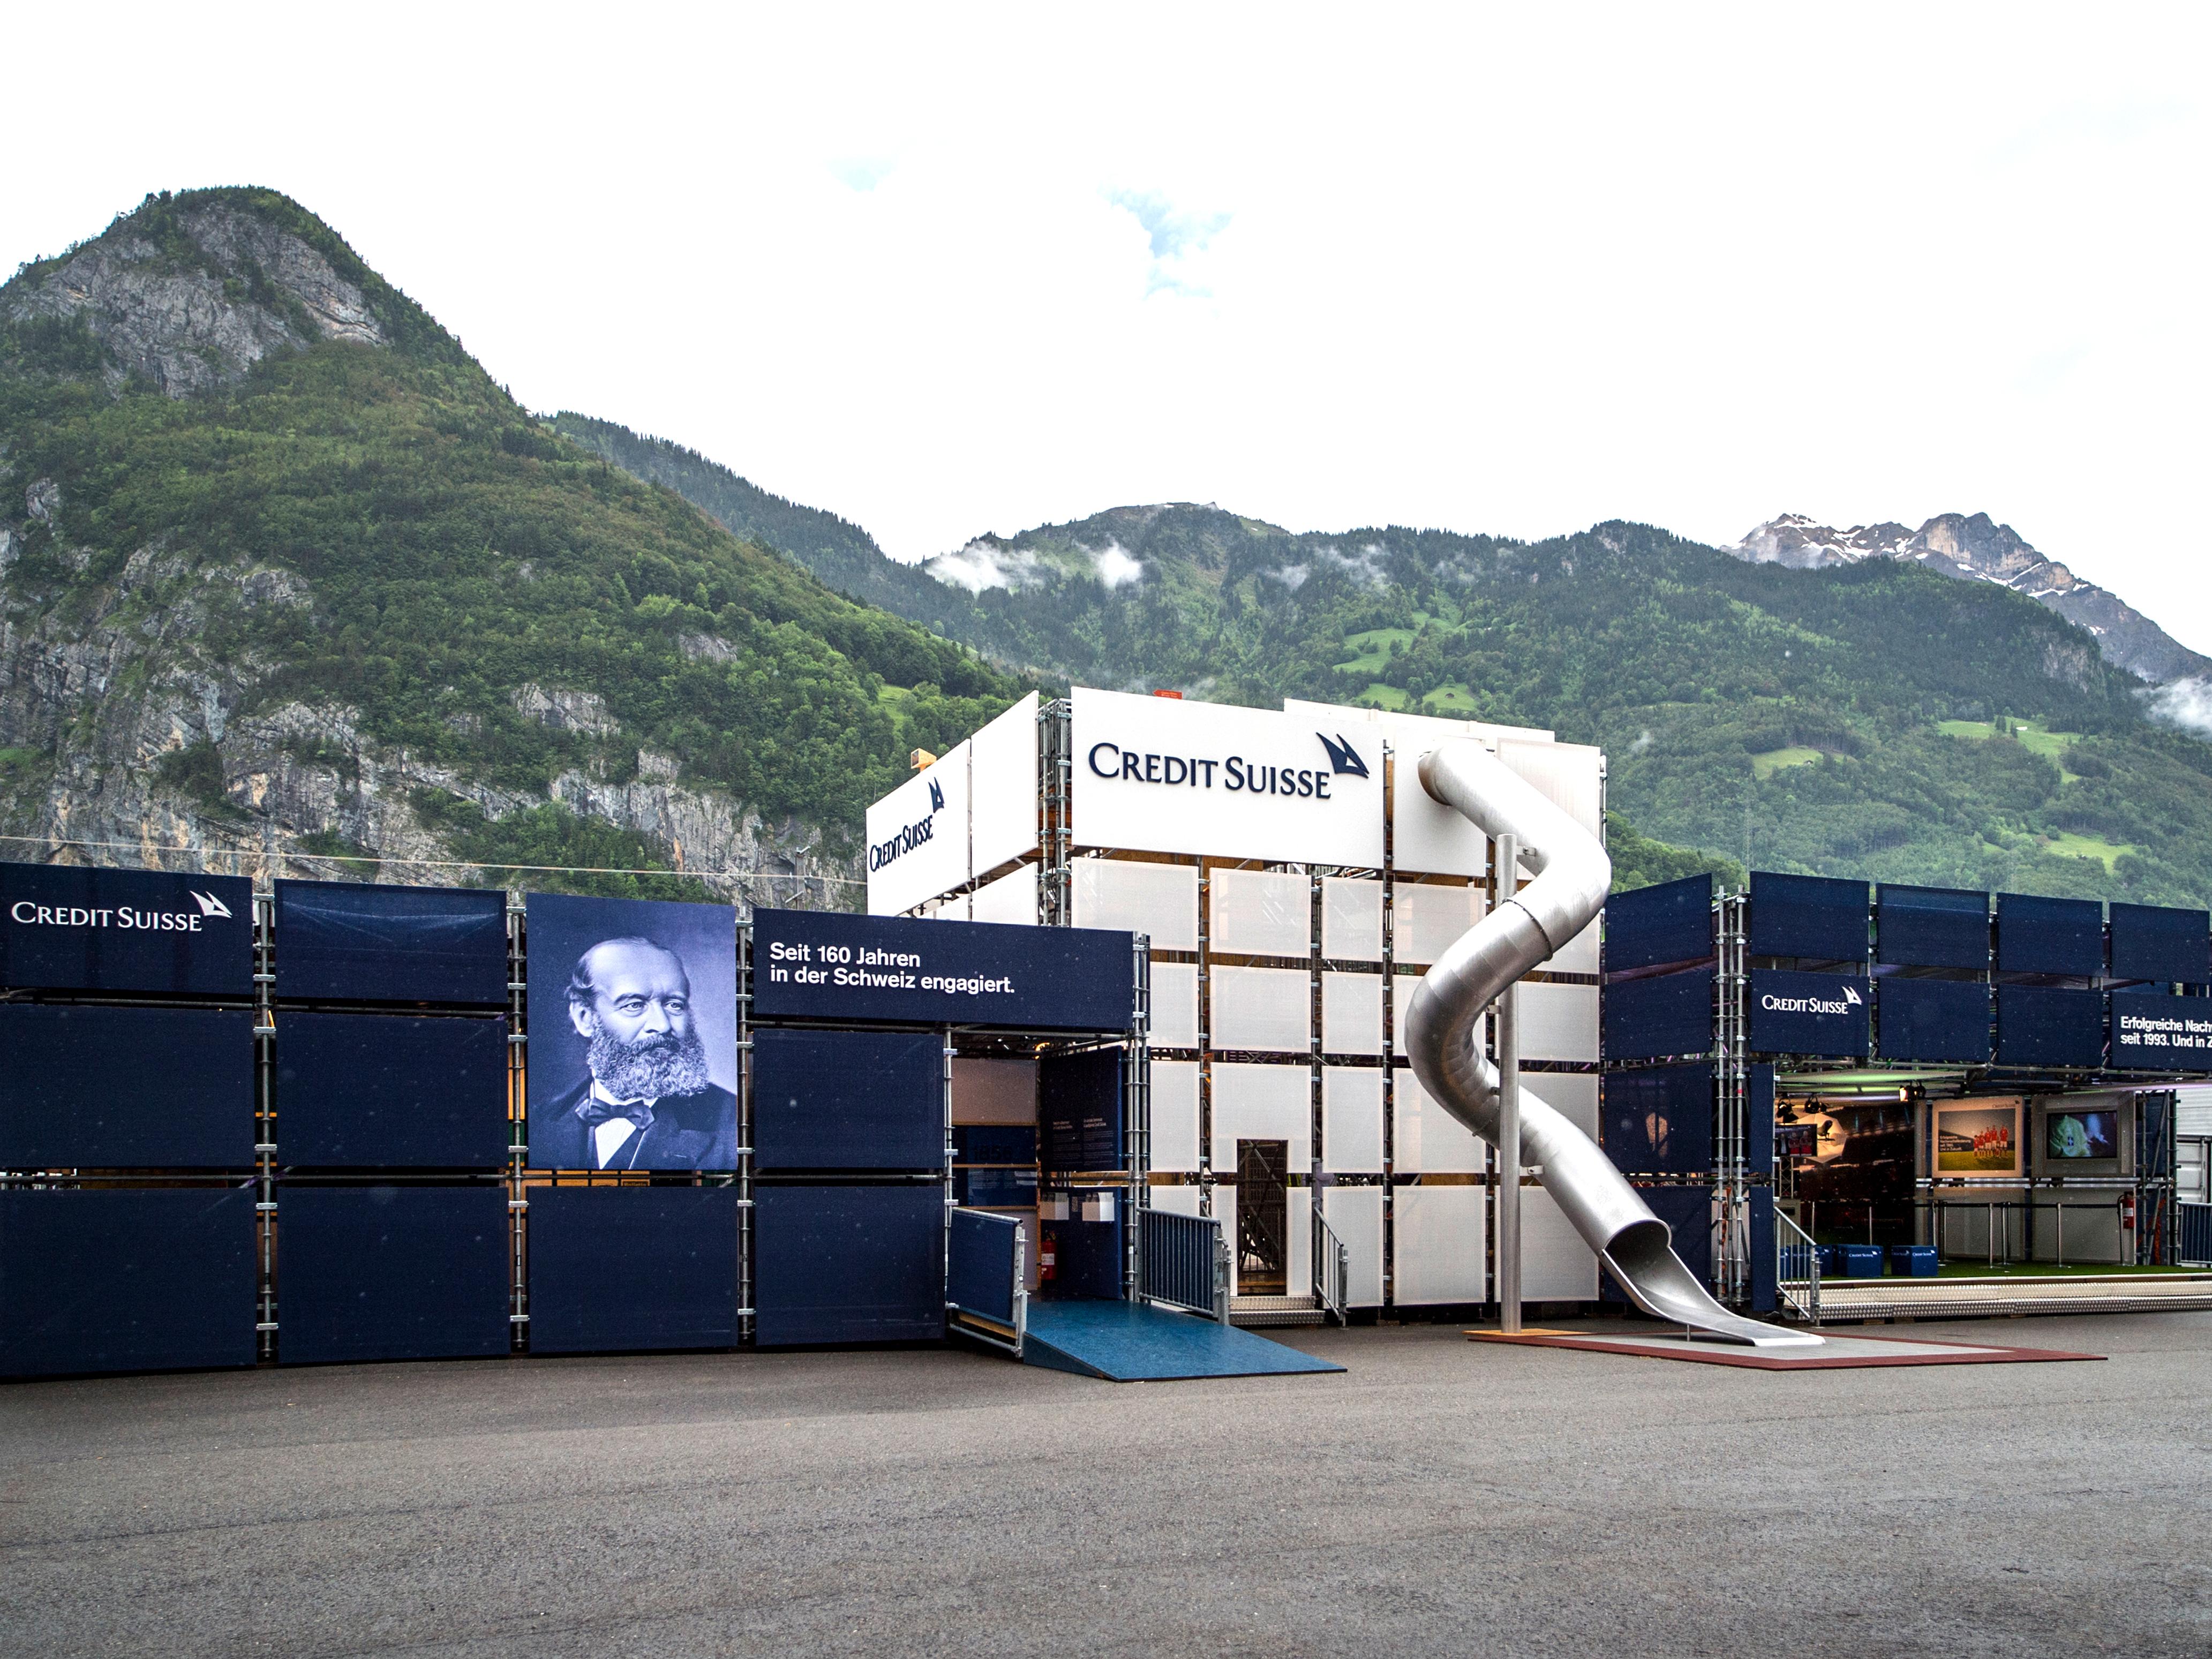 Credit Suisse Eröffnung Gottardo